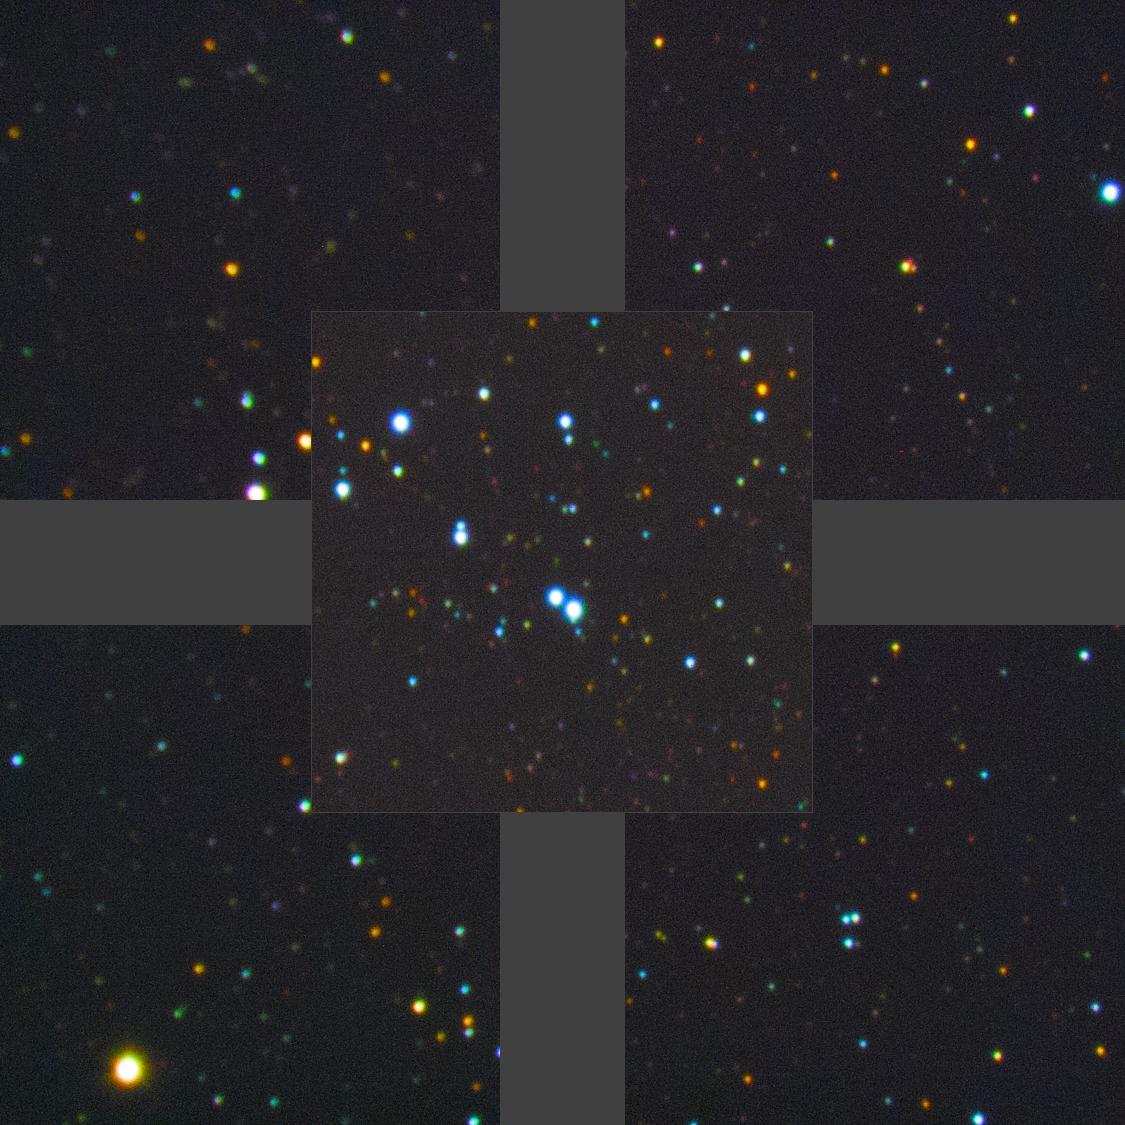 NGC6883_F8_5_EOS1000D_120s_800ASA_color_corners.JPG